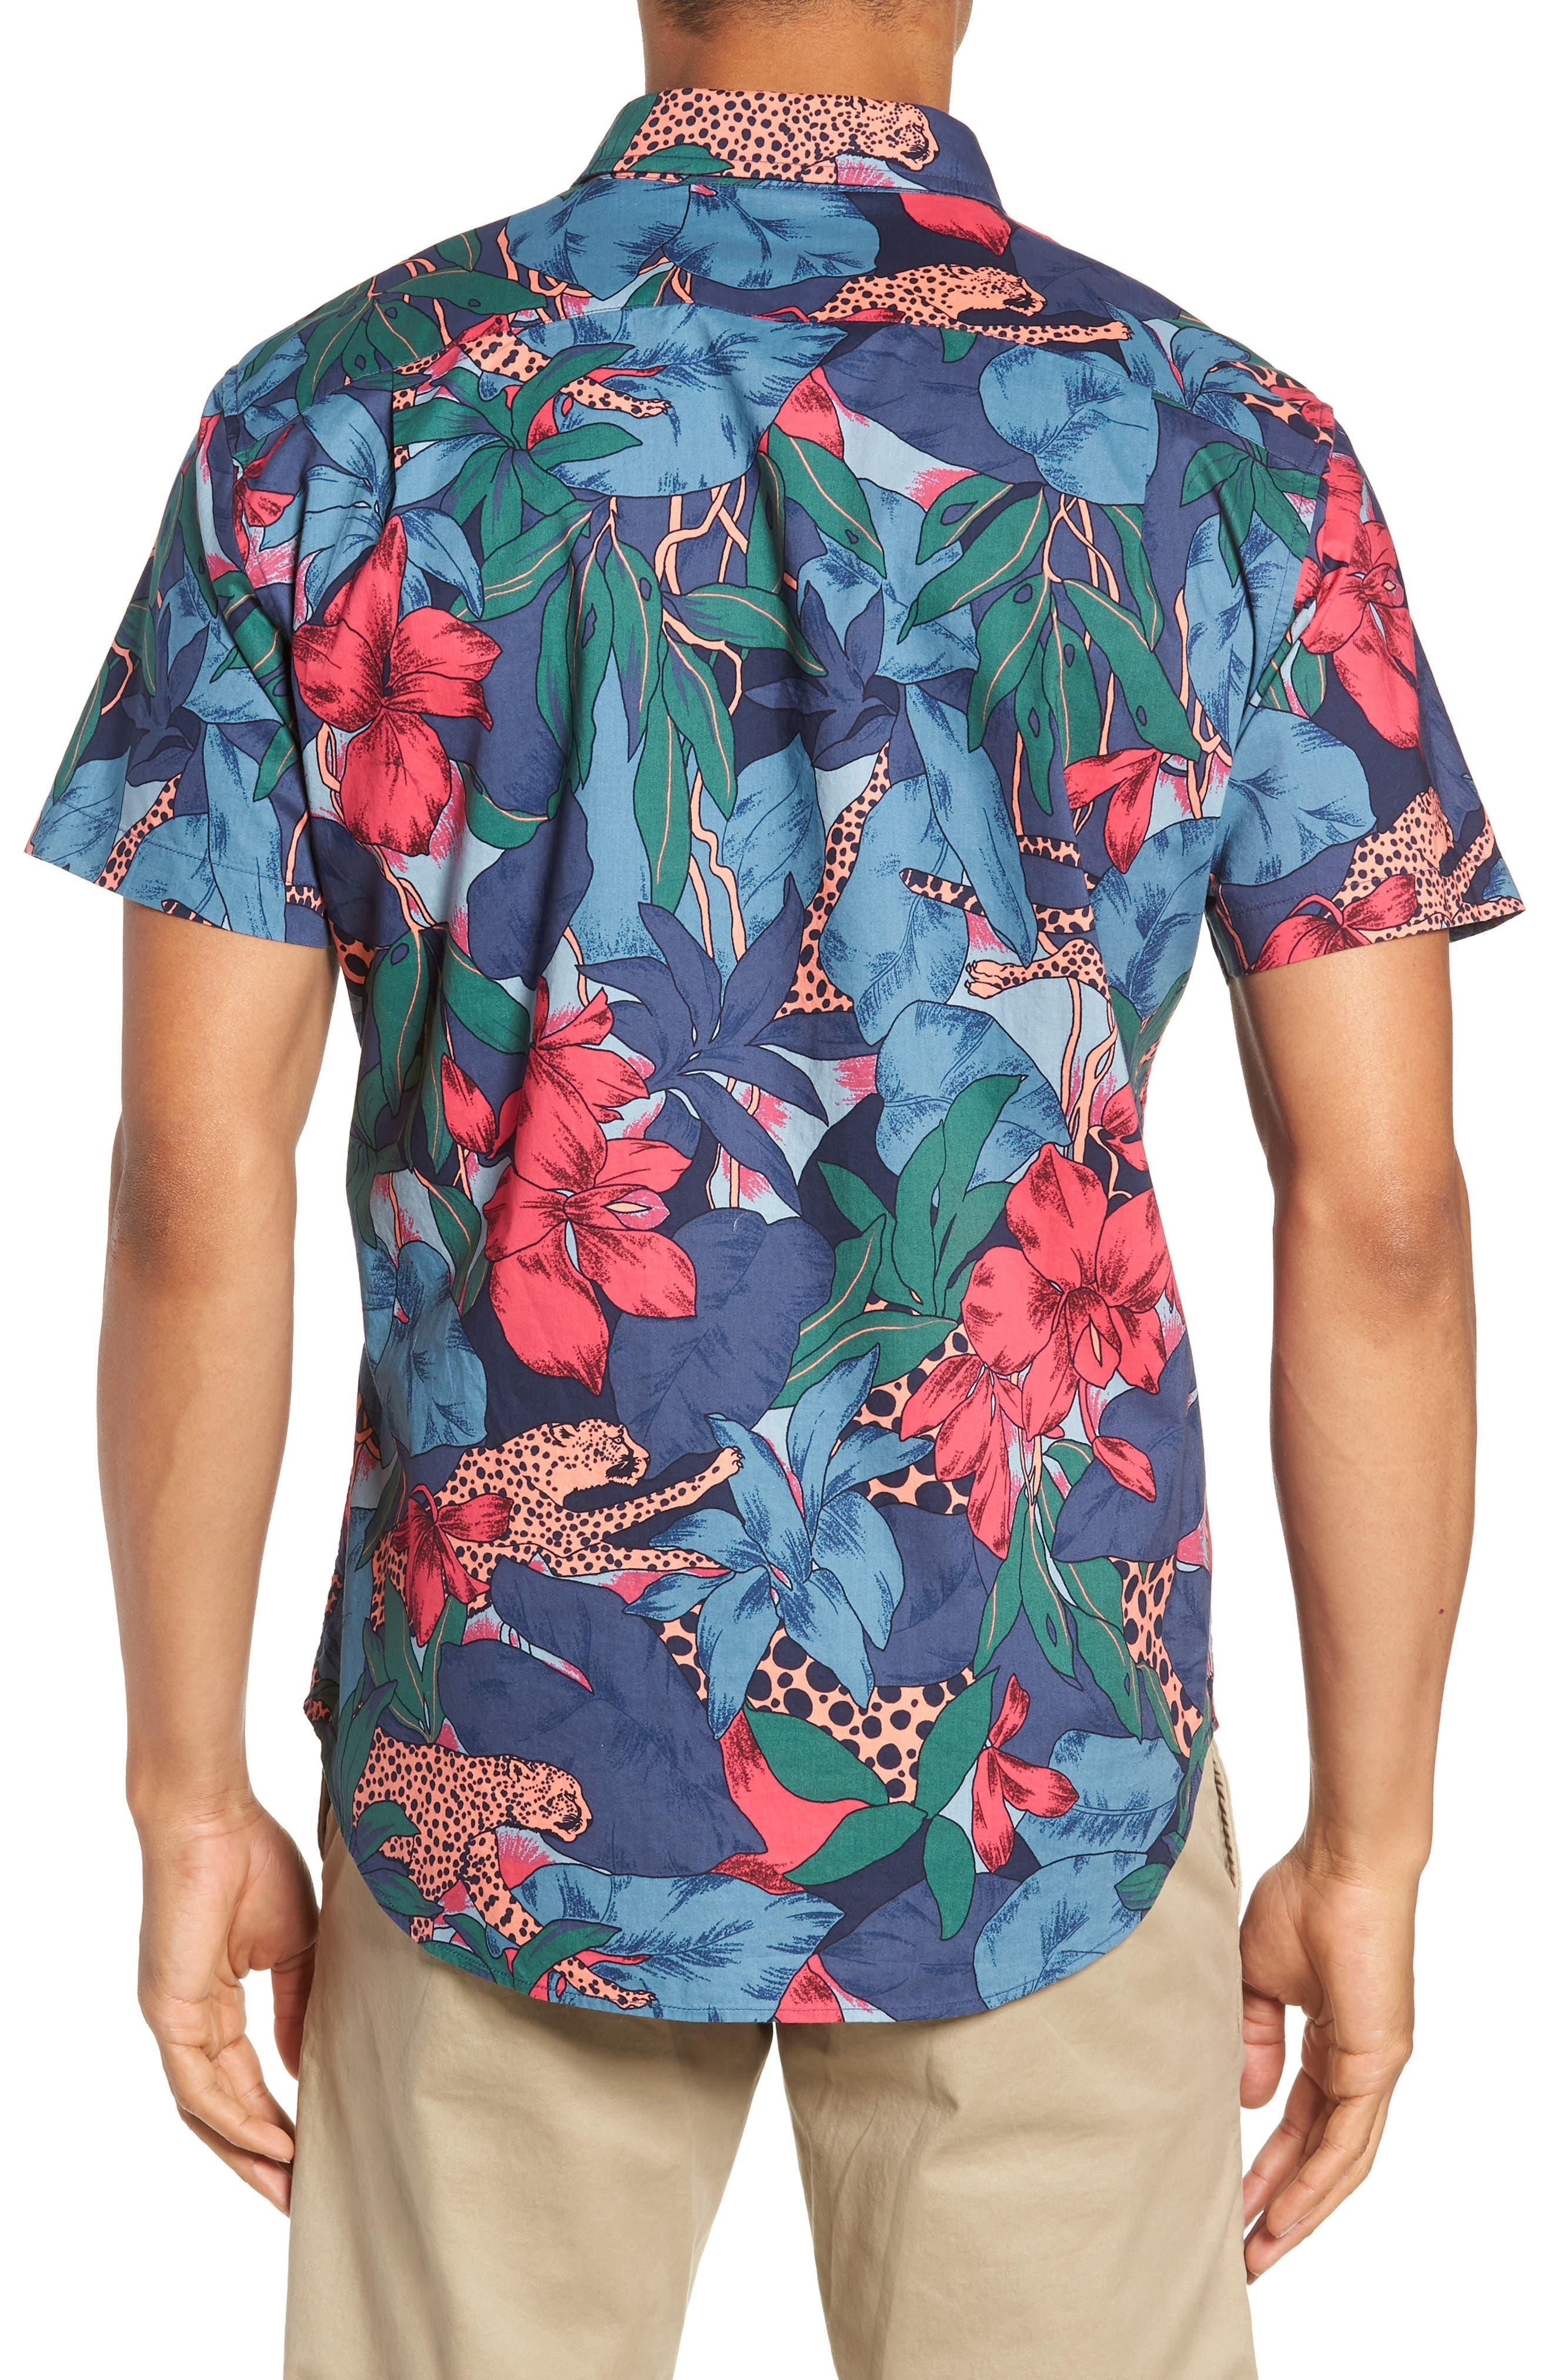 Riviera Slim Fit Leopard Floral Sport Shirt,                             Alternate thumbnail 3, color,                             WILD CATS - PEACH TWIG